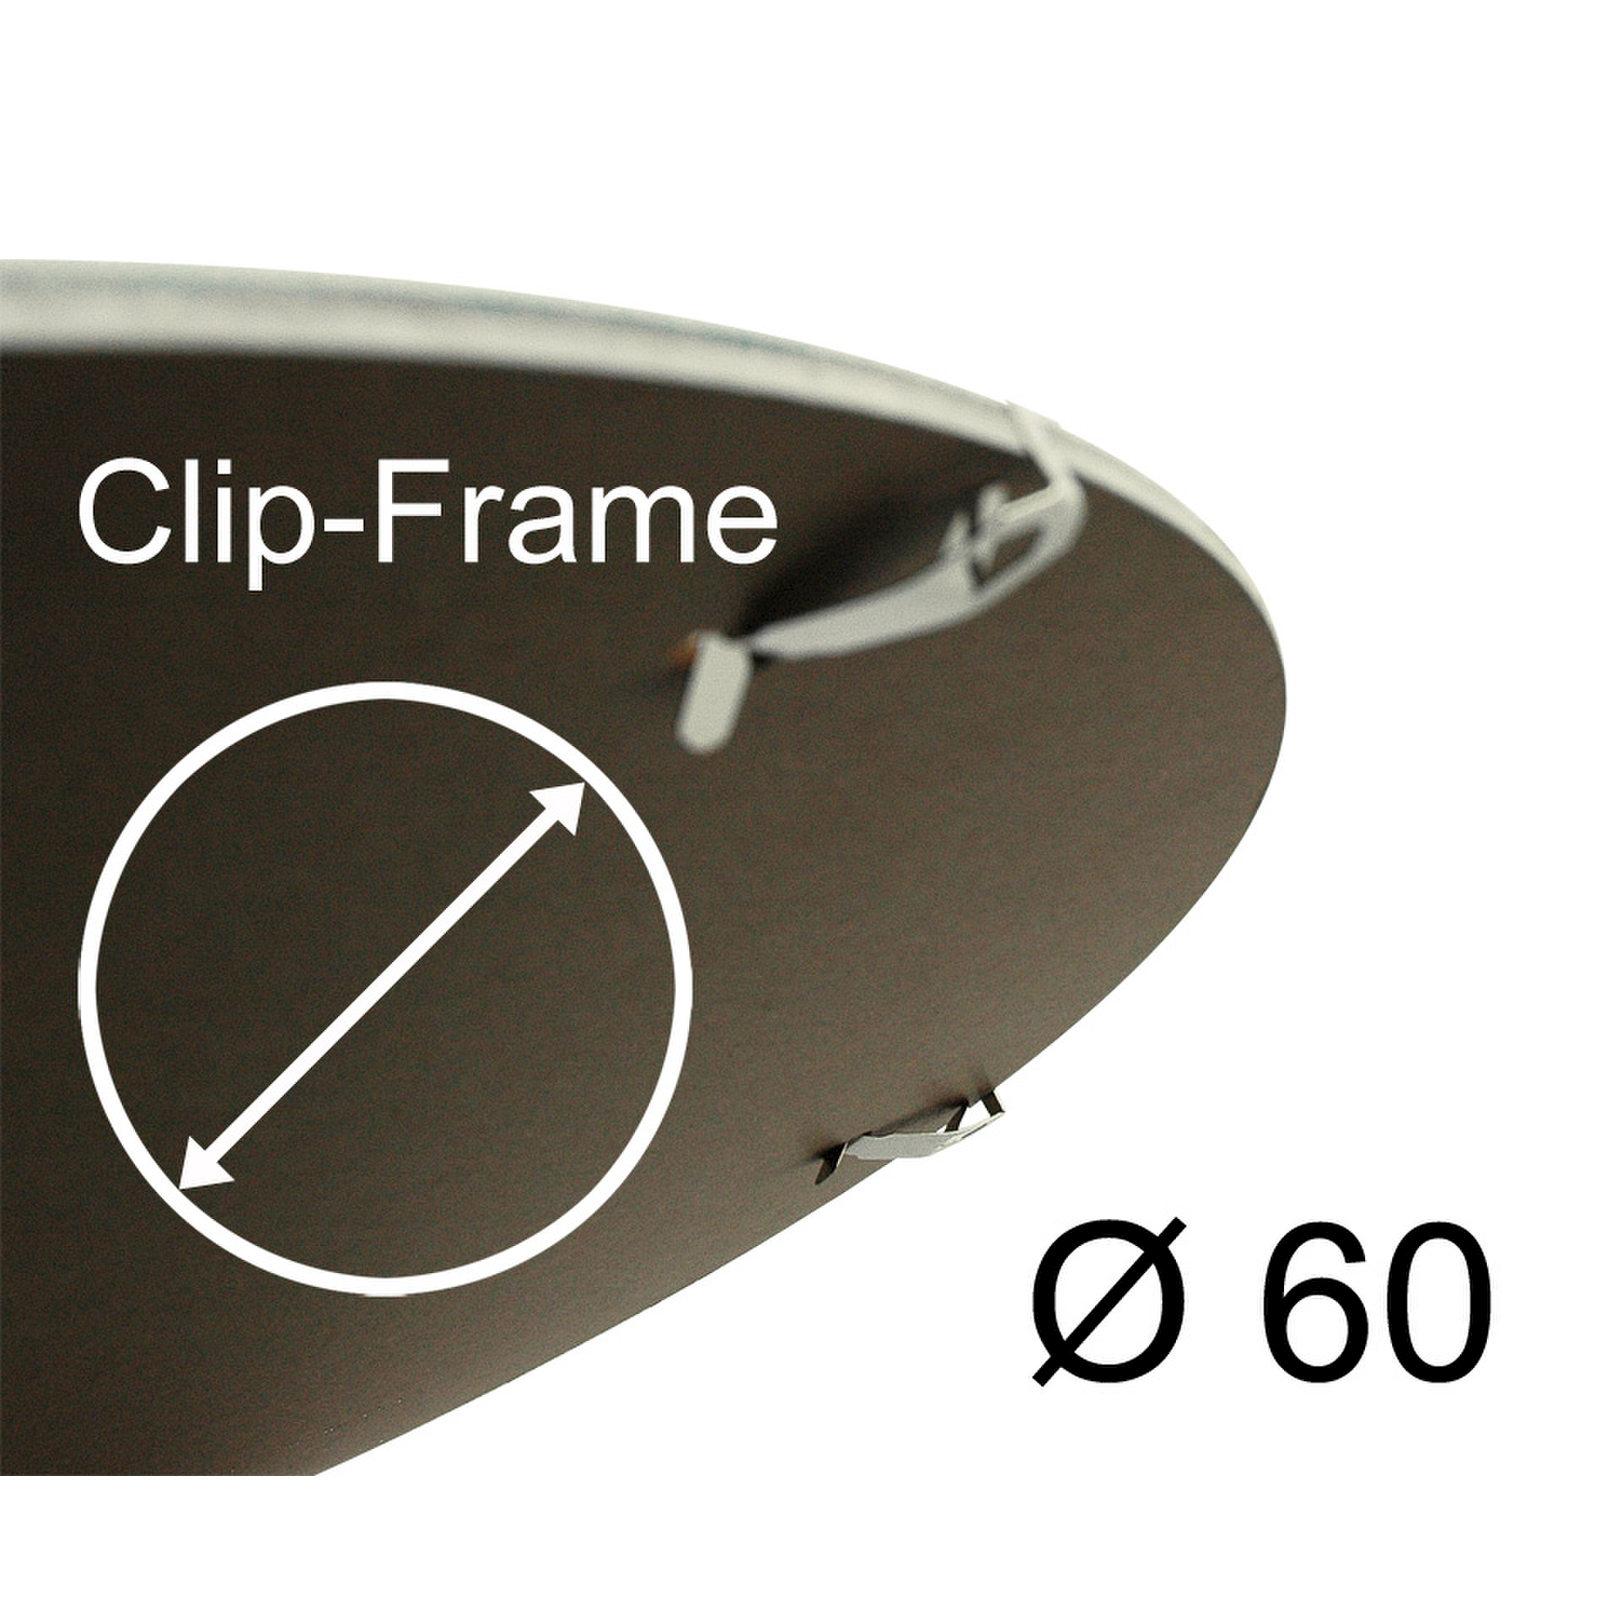 Sous verre clip cadre arrondi verre polystyrene ebay for Clip de verre cadres photo ikea